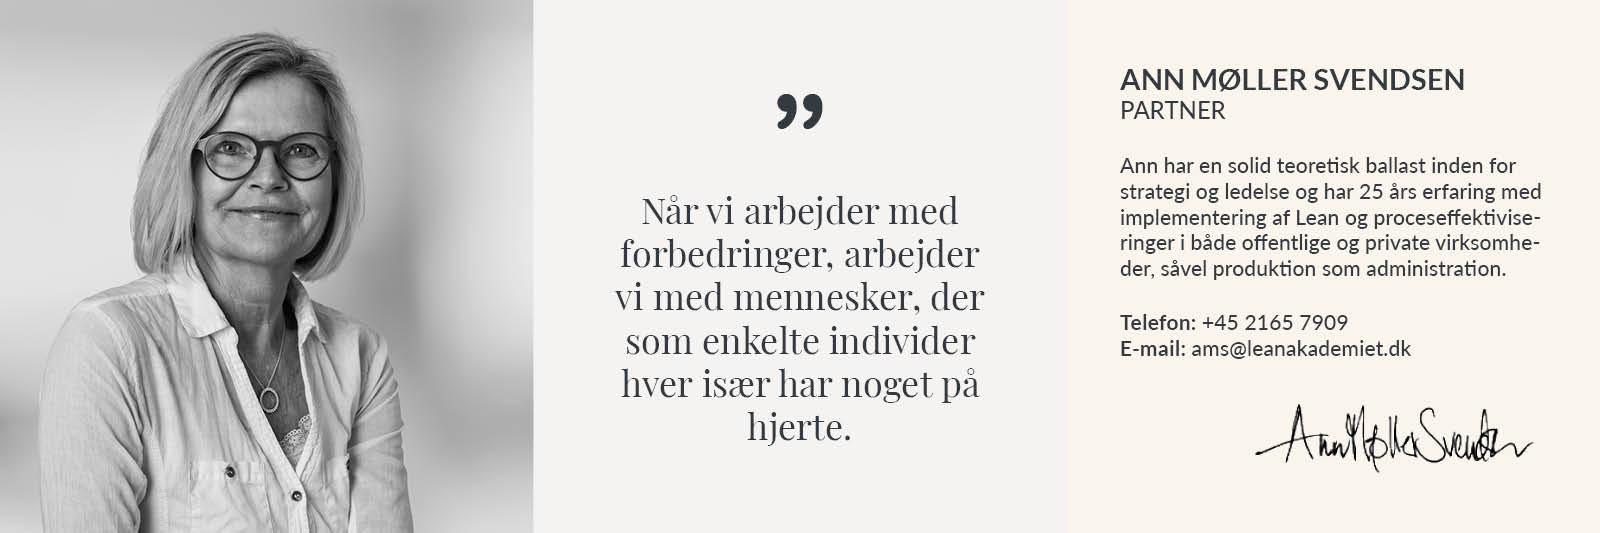 Profil præsentation Lean Akademiet - Ann Møller Svendsen